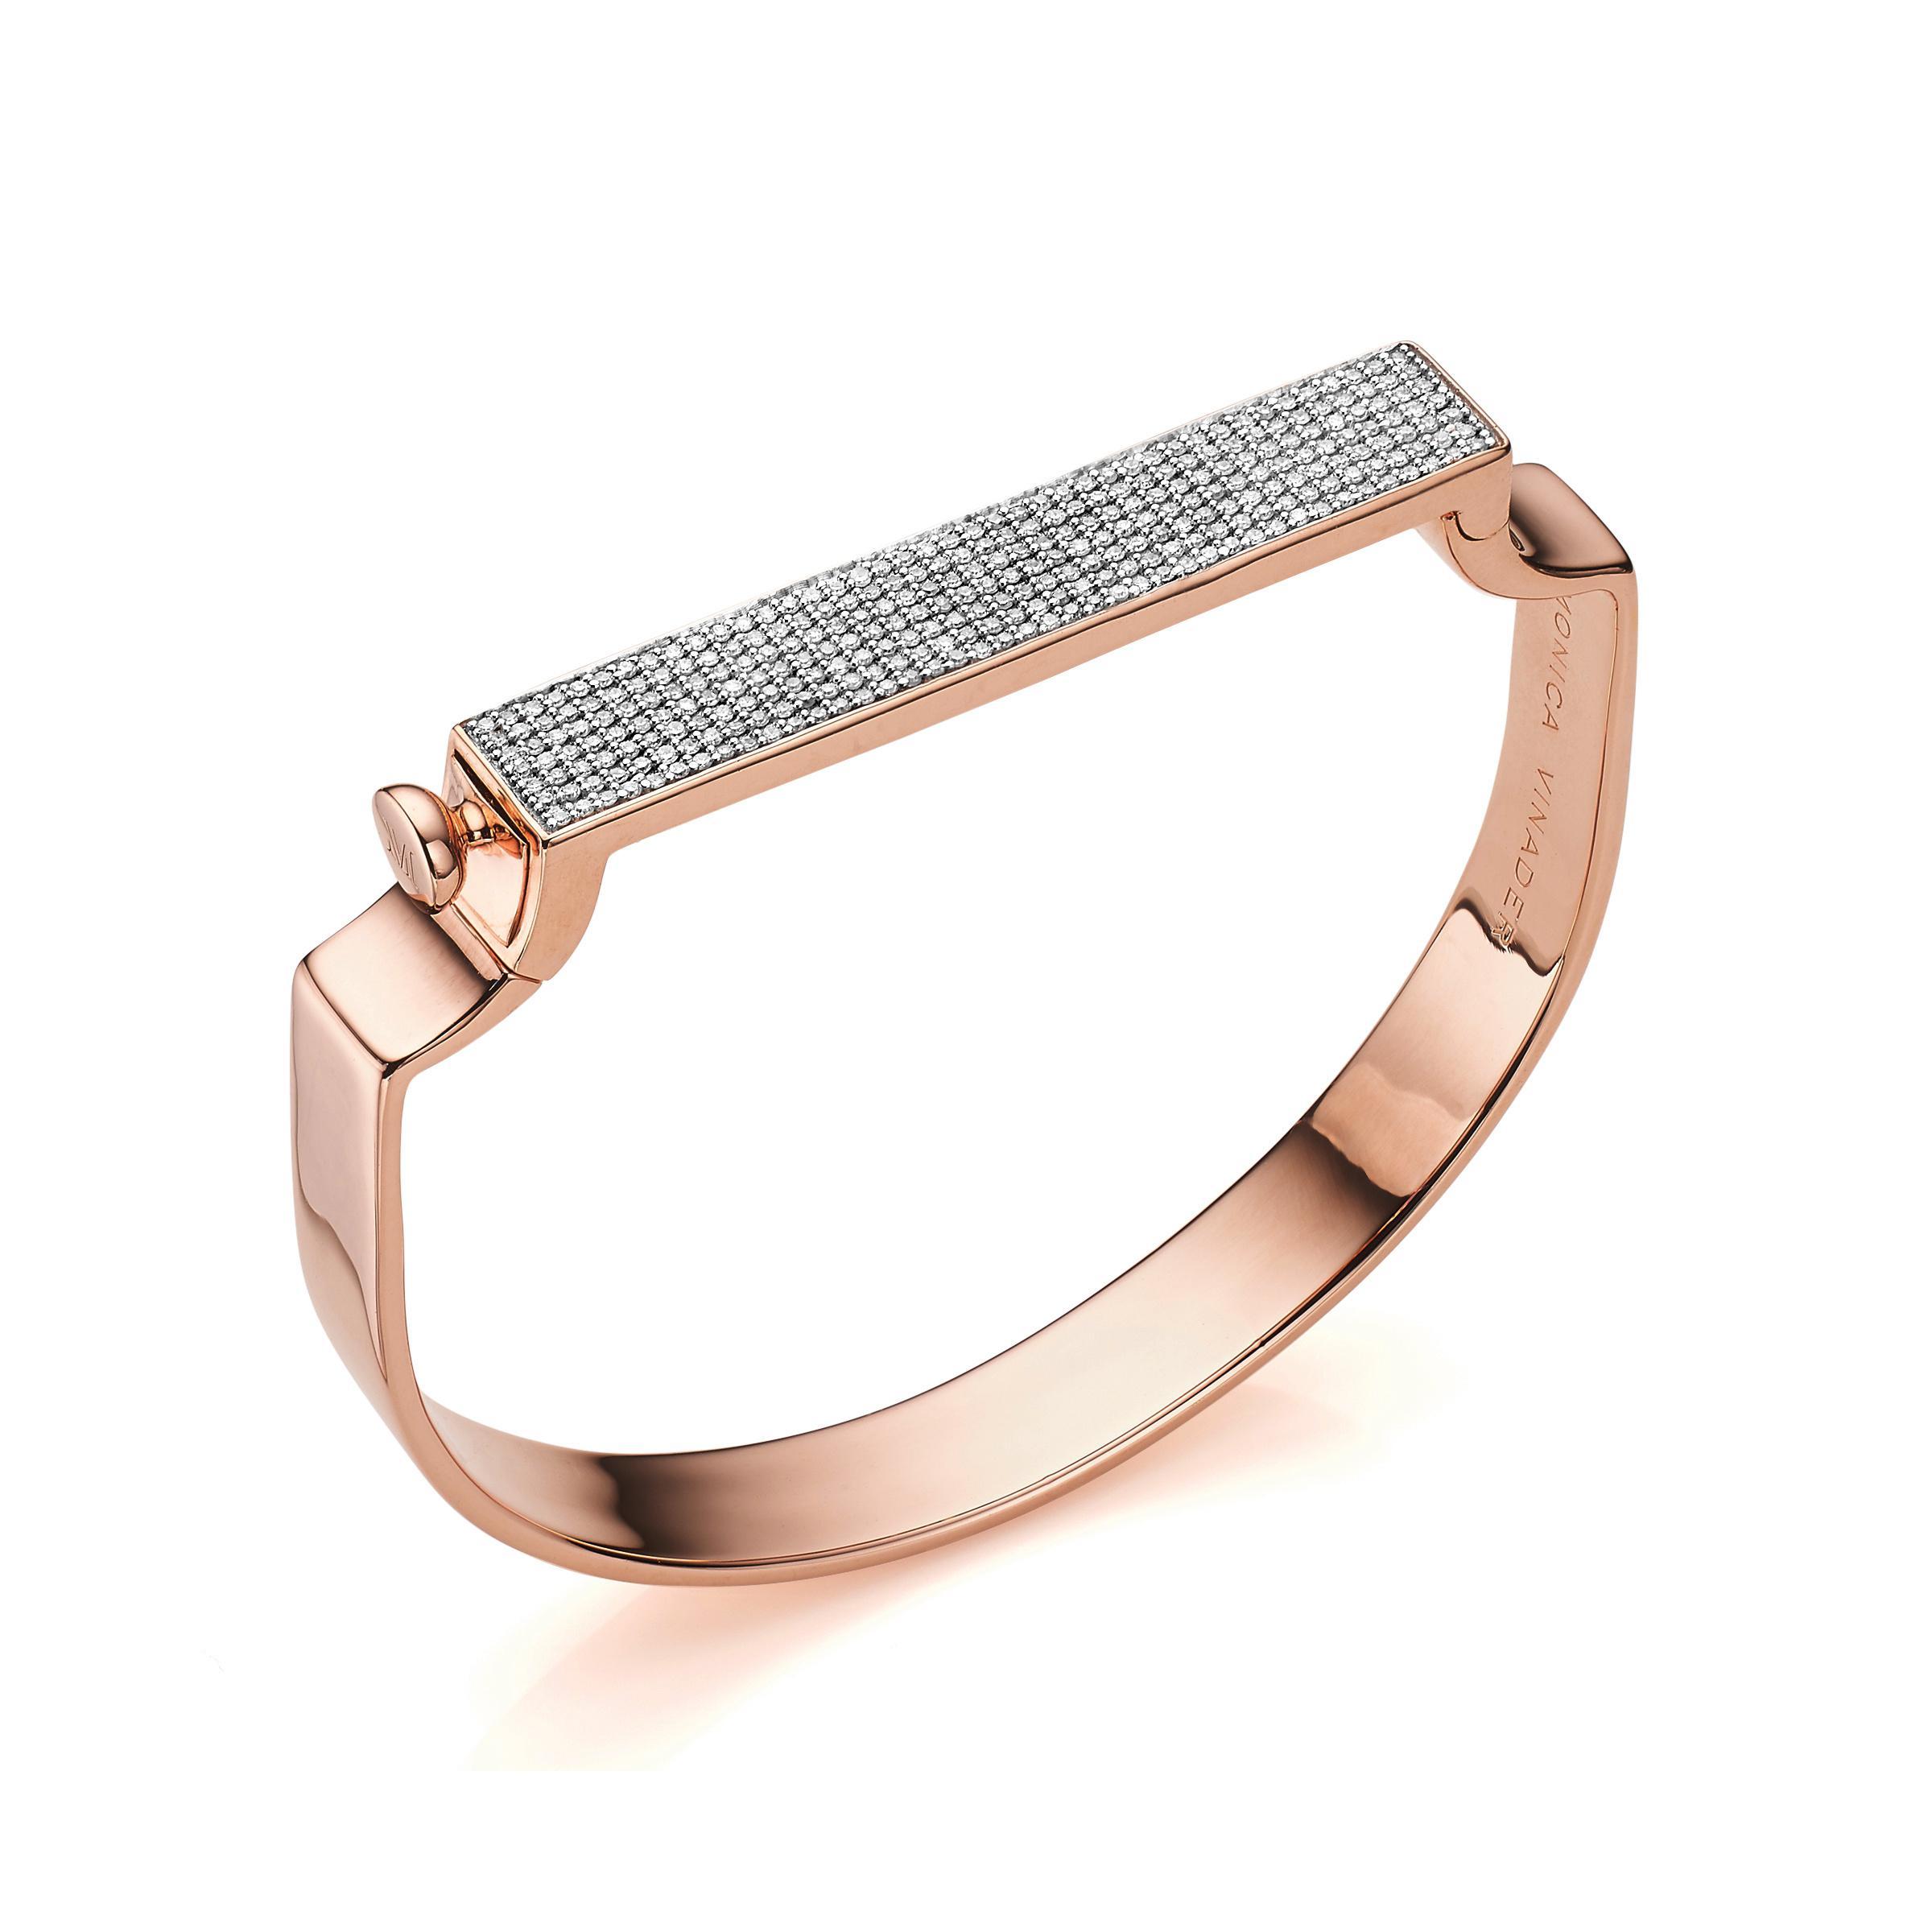 Signature Argent Sterling Diamant Bracelet Diamant Monica Vinader eyOX3TM